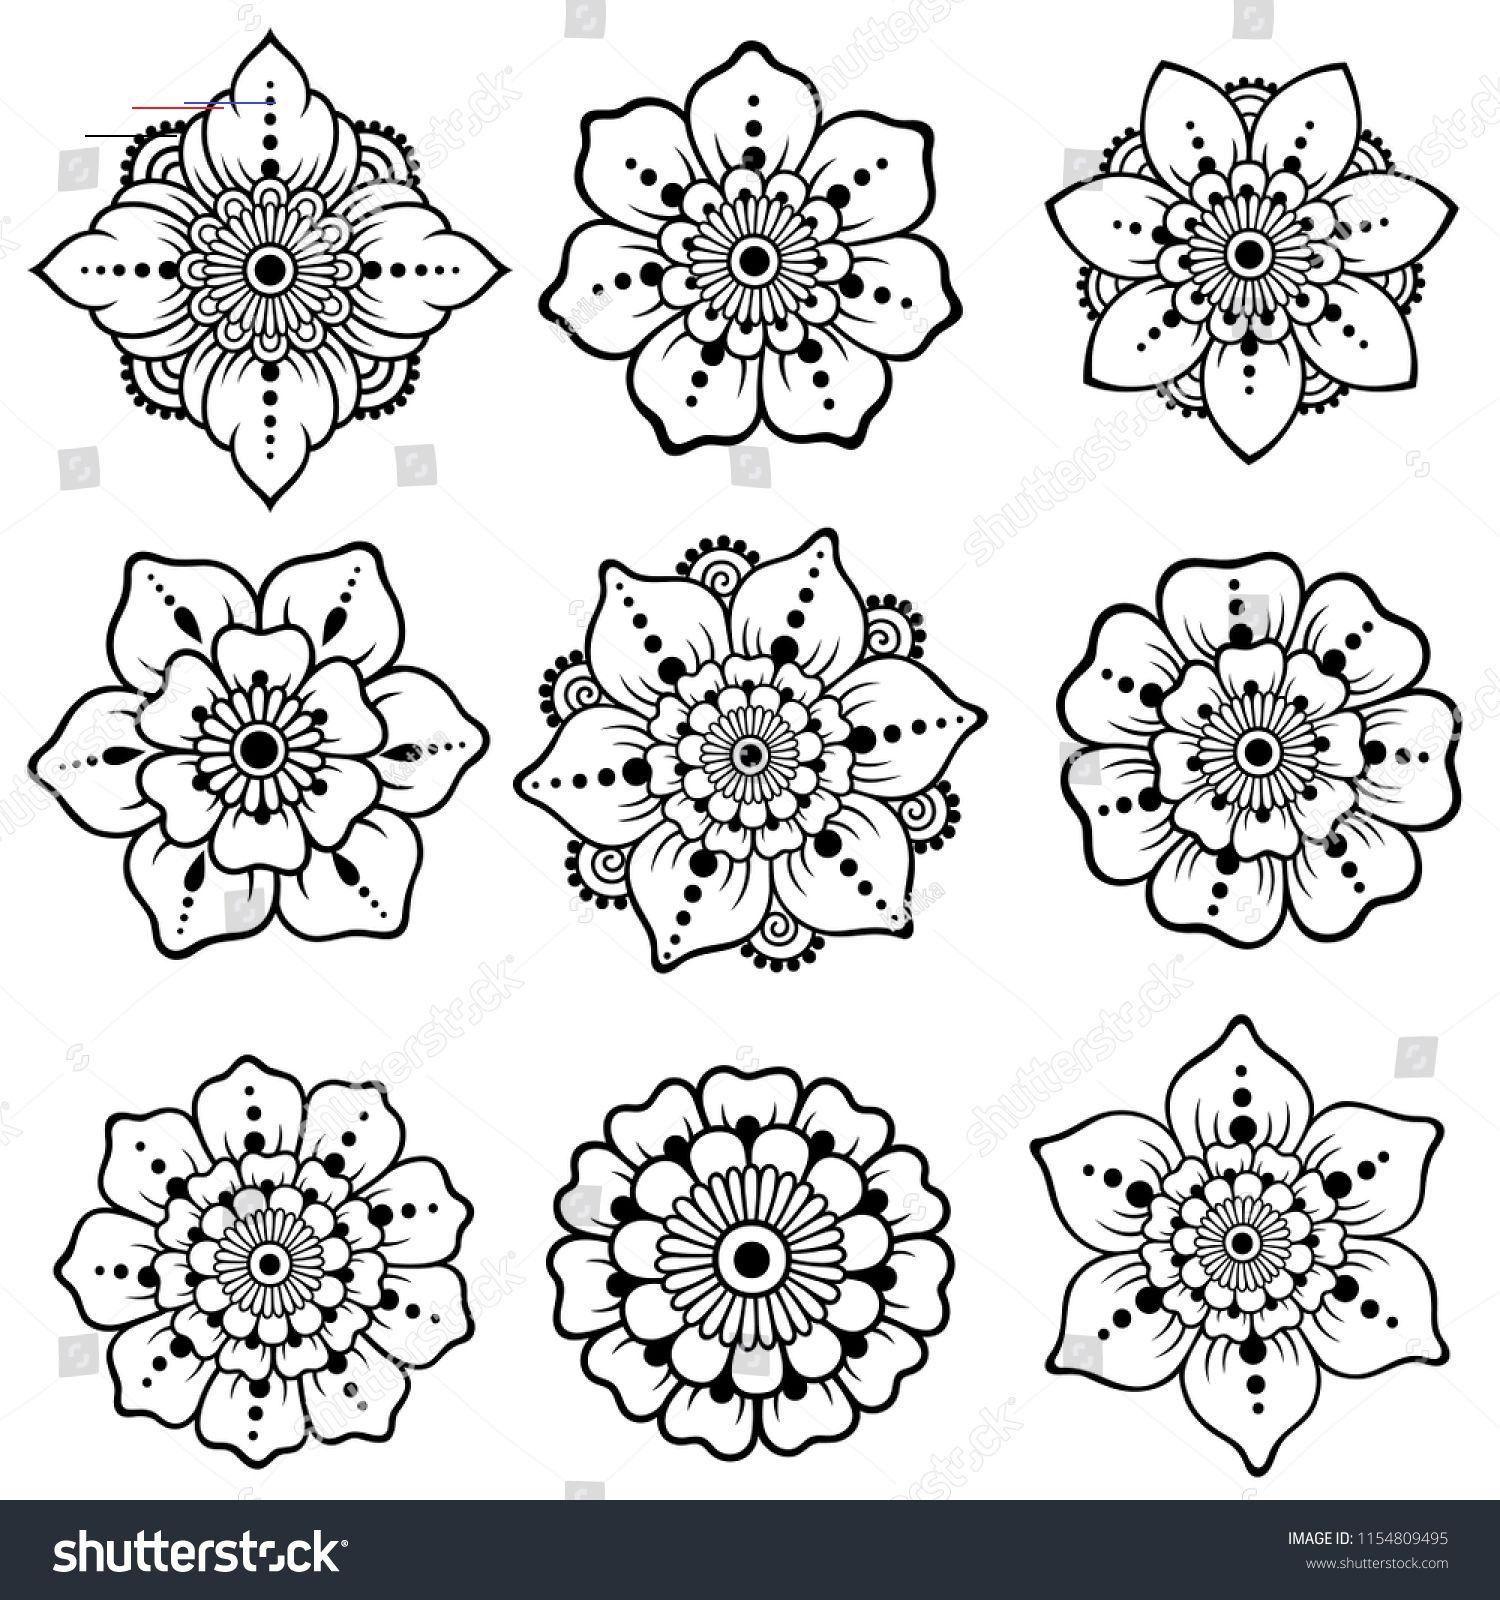 Set Mehndi Flower Pattern Henna Drawing Stock Vector Royalty Free 1154809495 Hennapatterns In 2020 Eenvoudige Henna Henna Patronen Mandala Kleurplaten